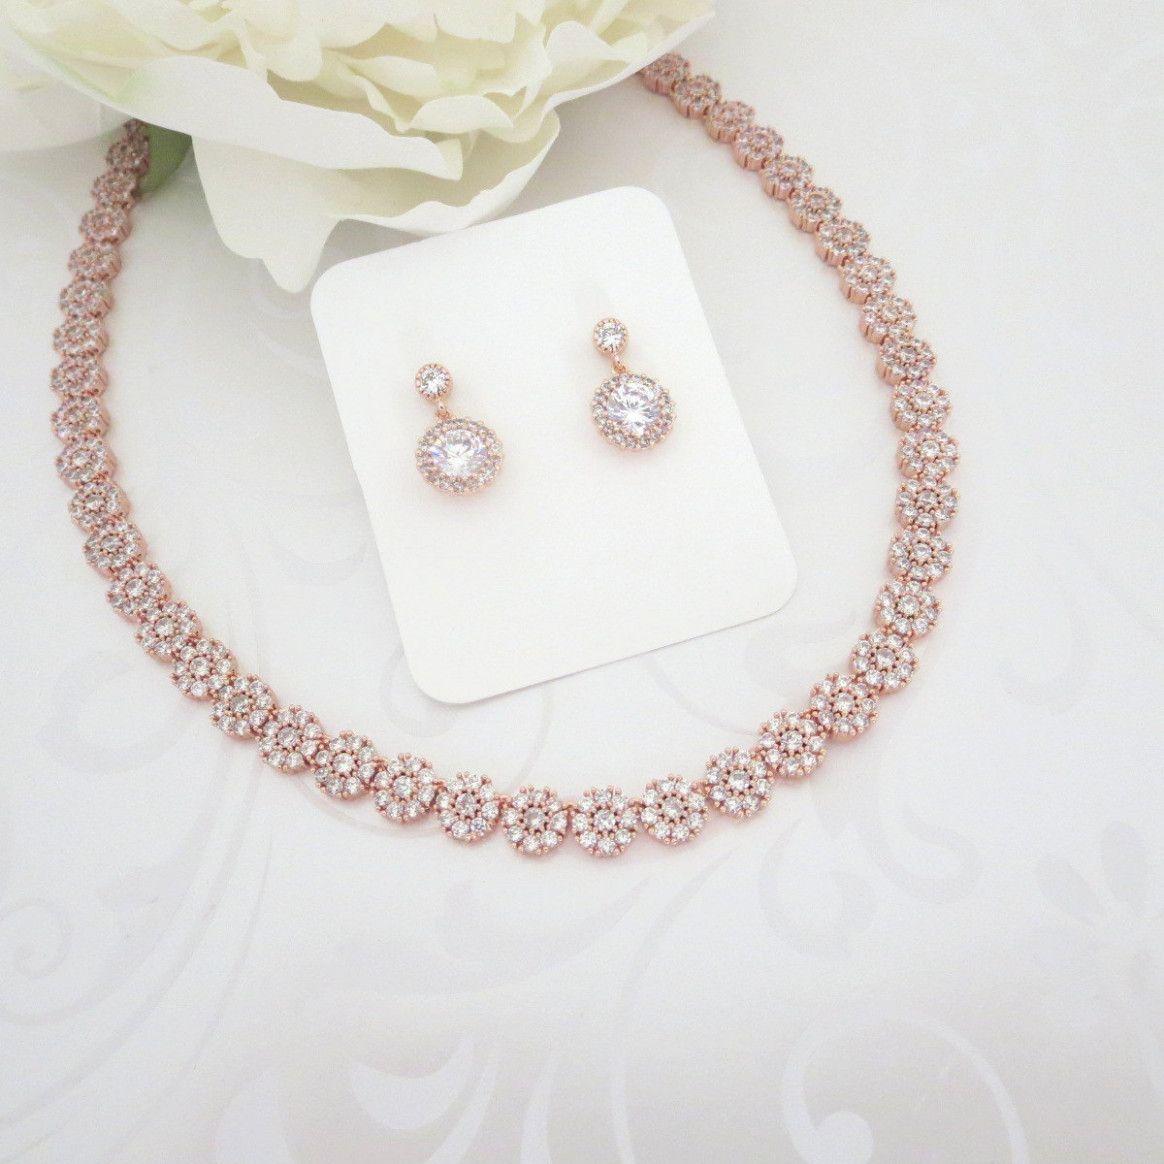 Minimalist wedding jewelry gold necklaces rose gold